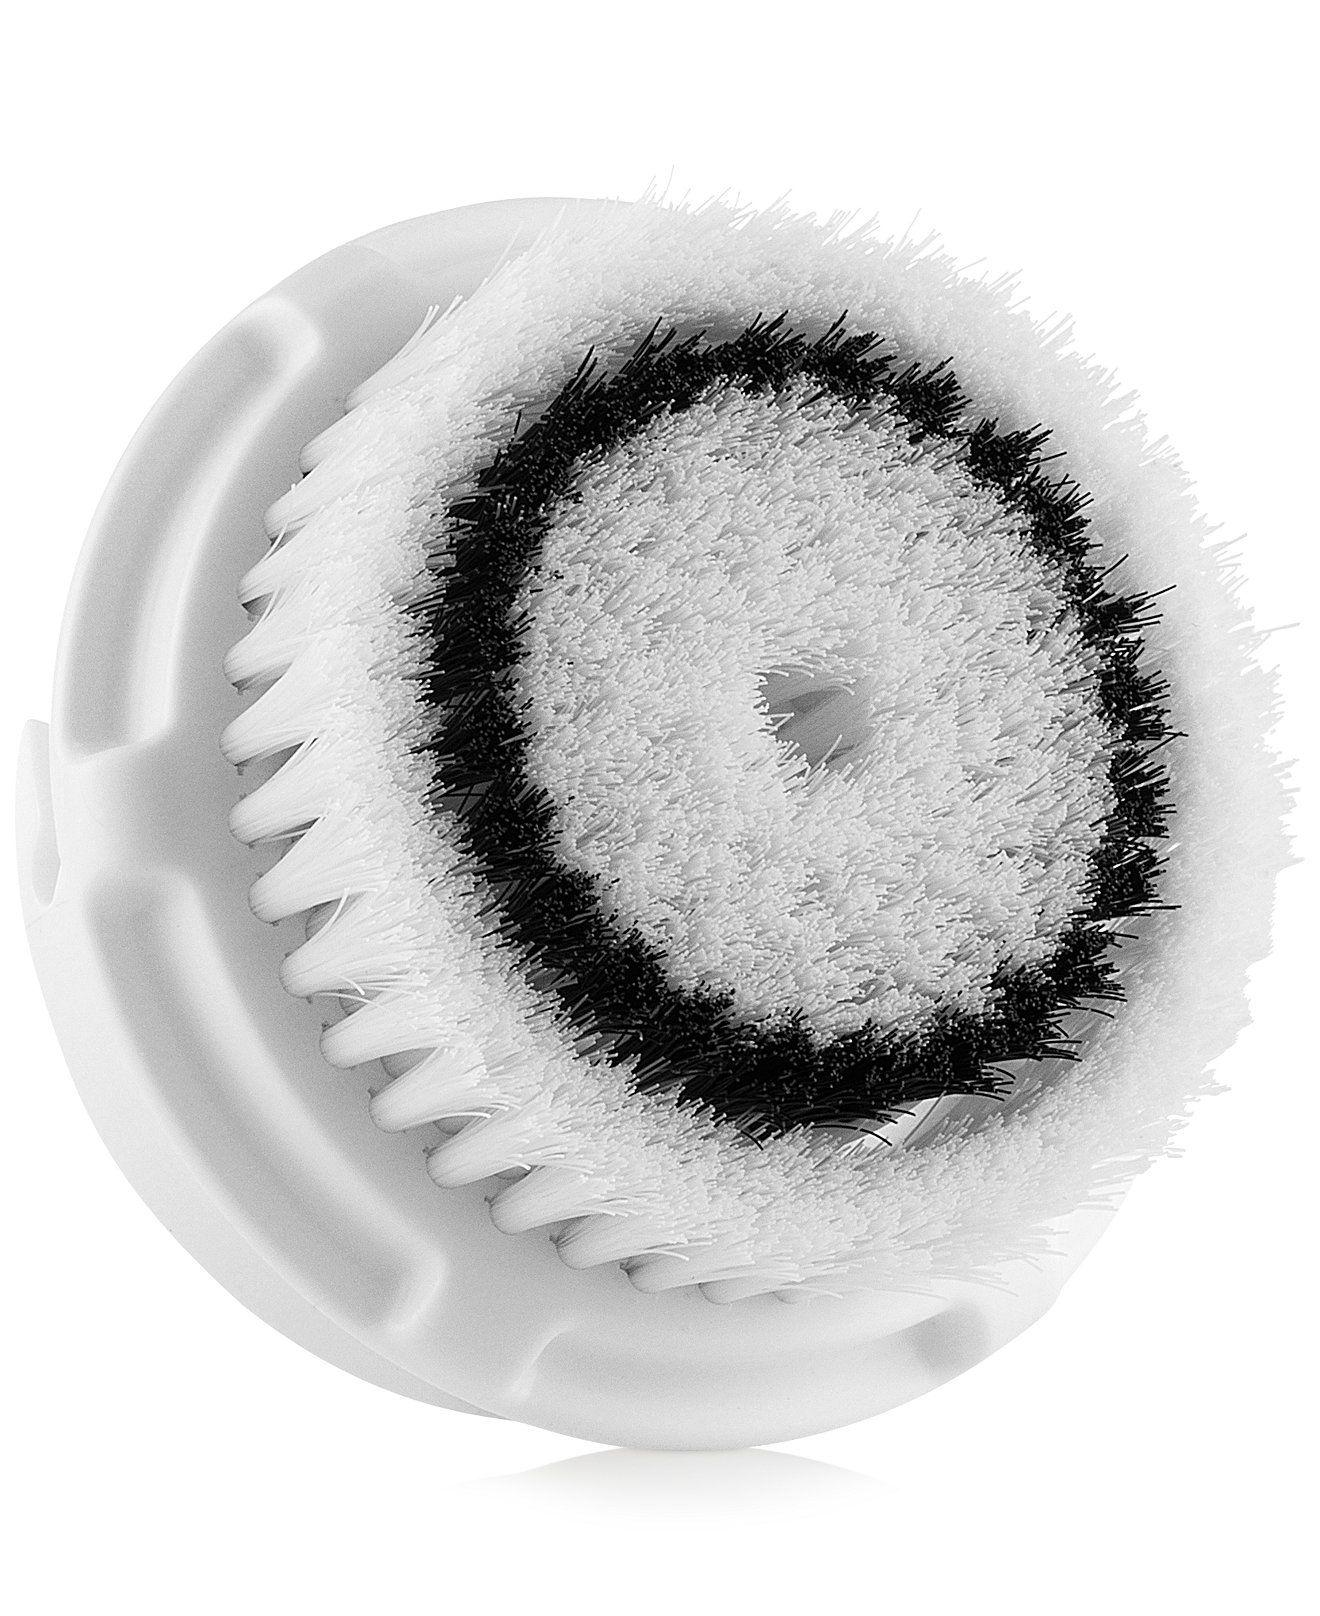 Clarisonic Sensitive Cleansing Brush Head, Single Skin